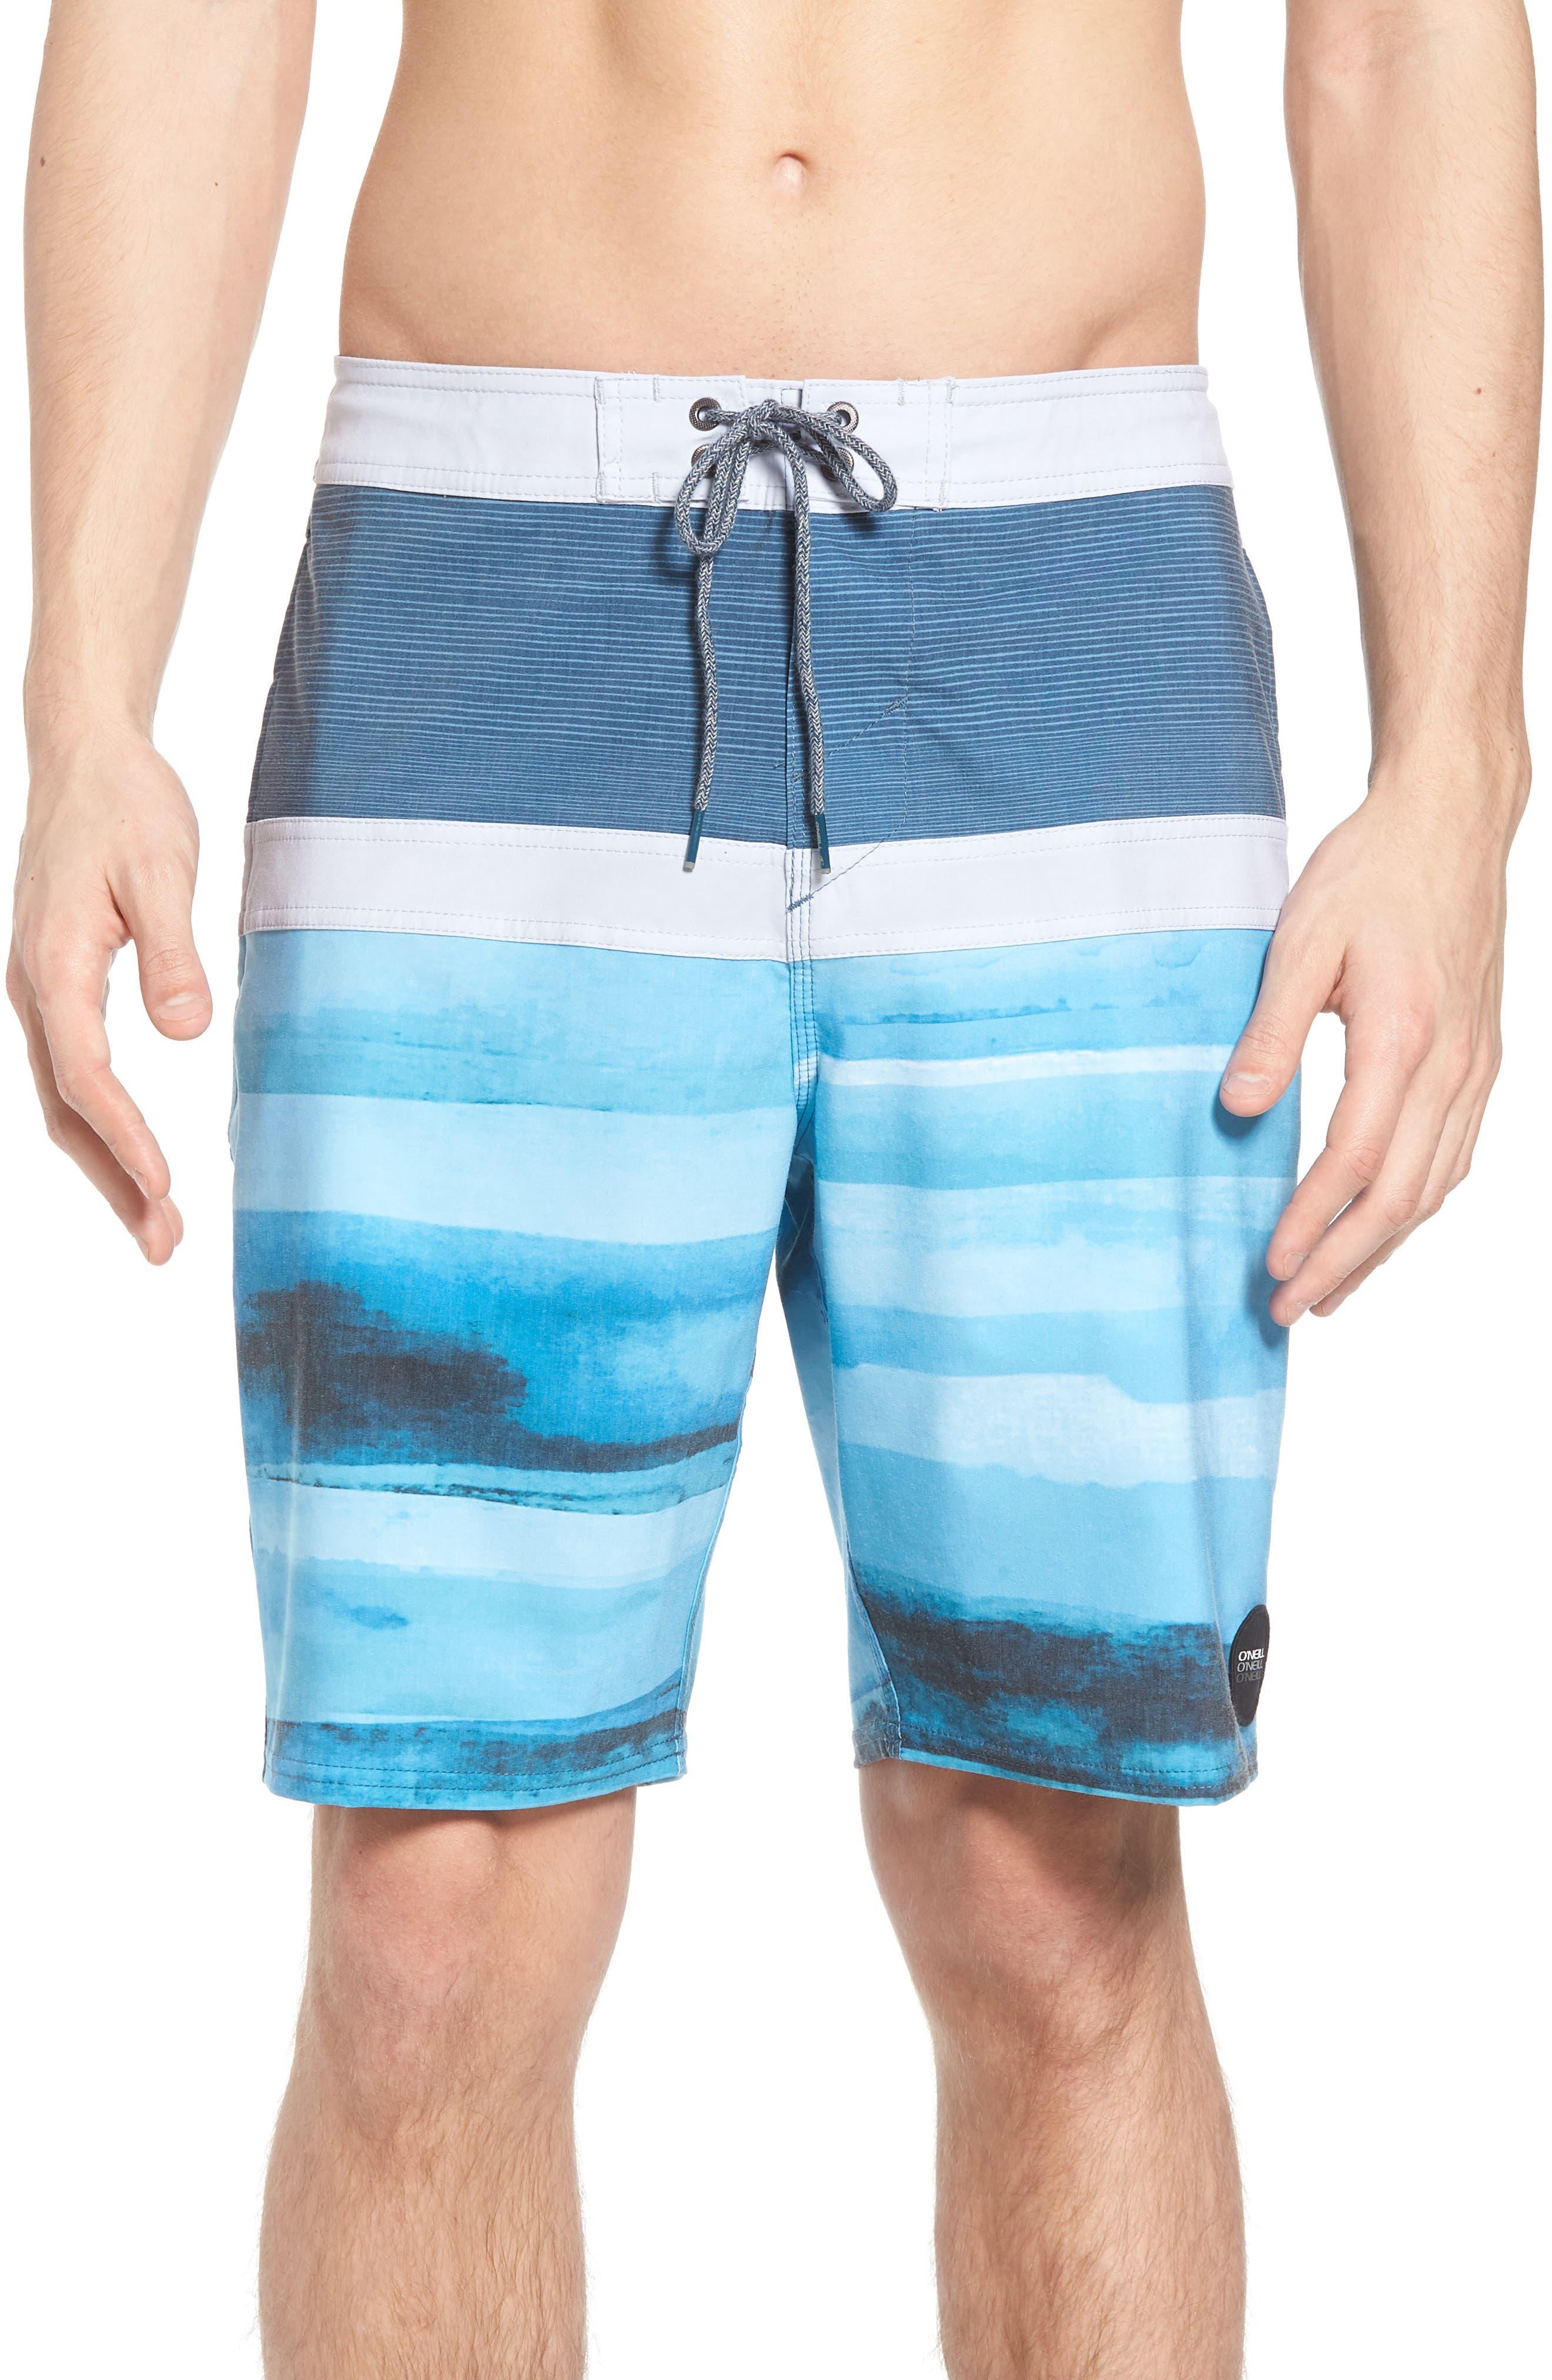 O'Neill Breaker Cruzer Board Shorts